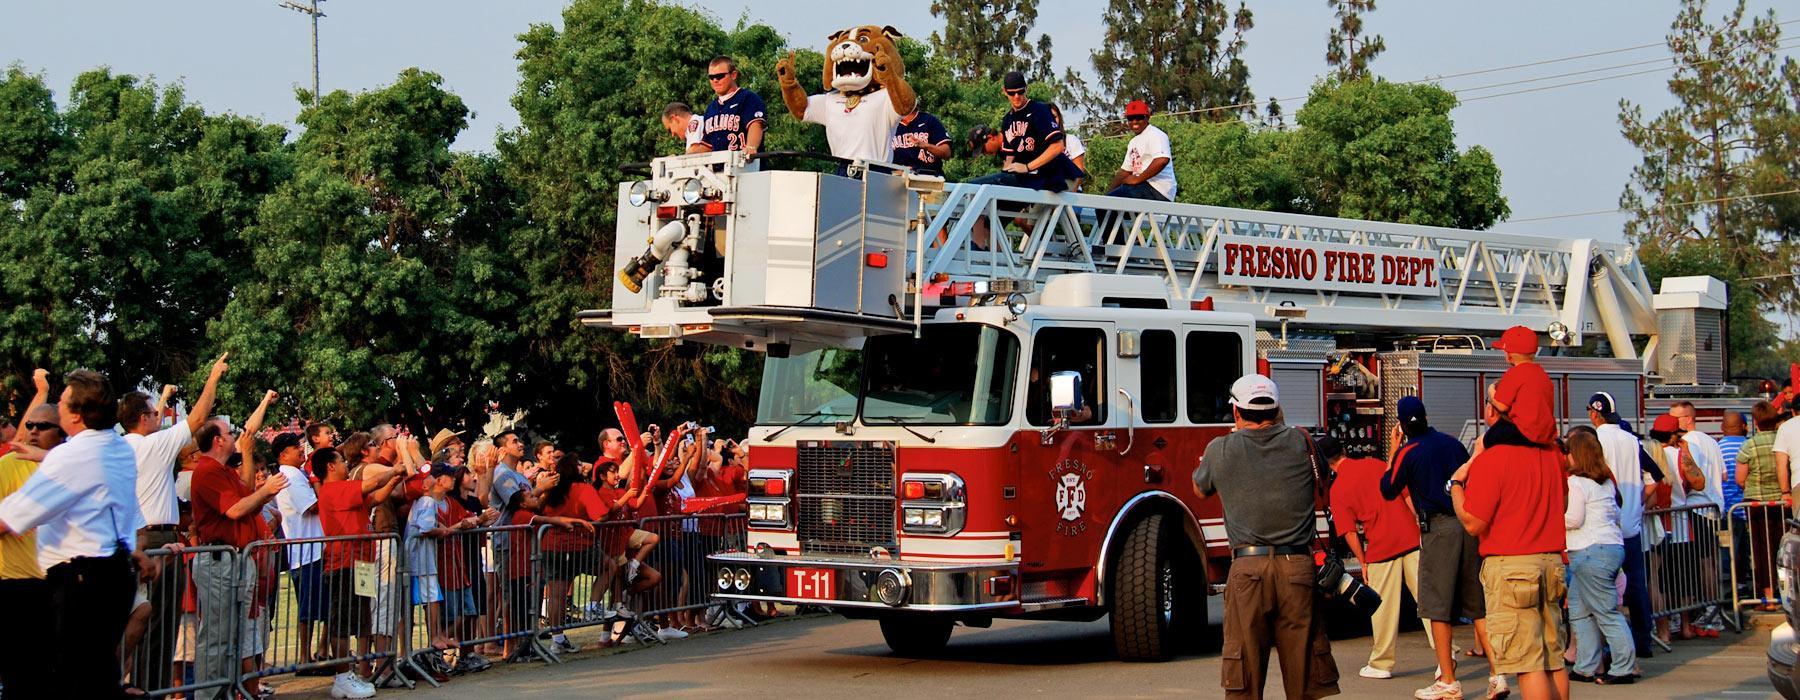 sports fire department